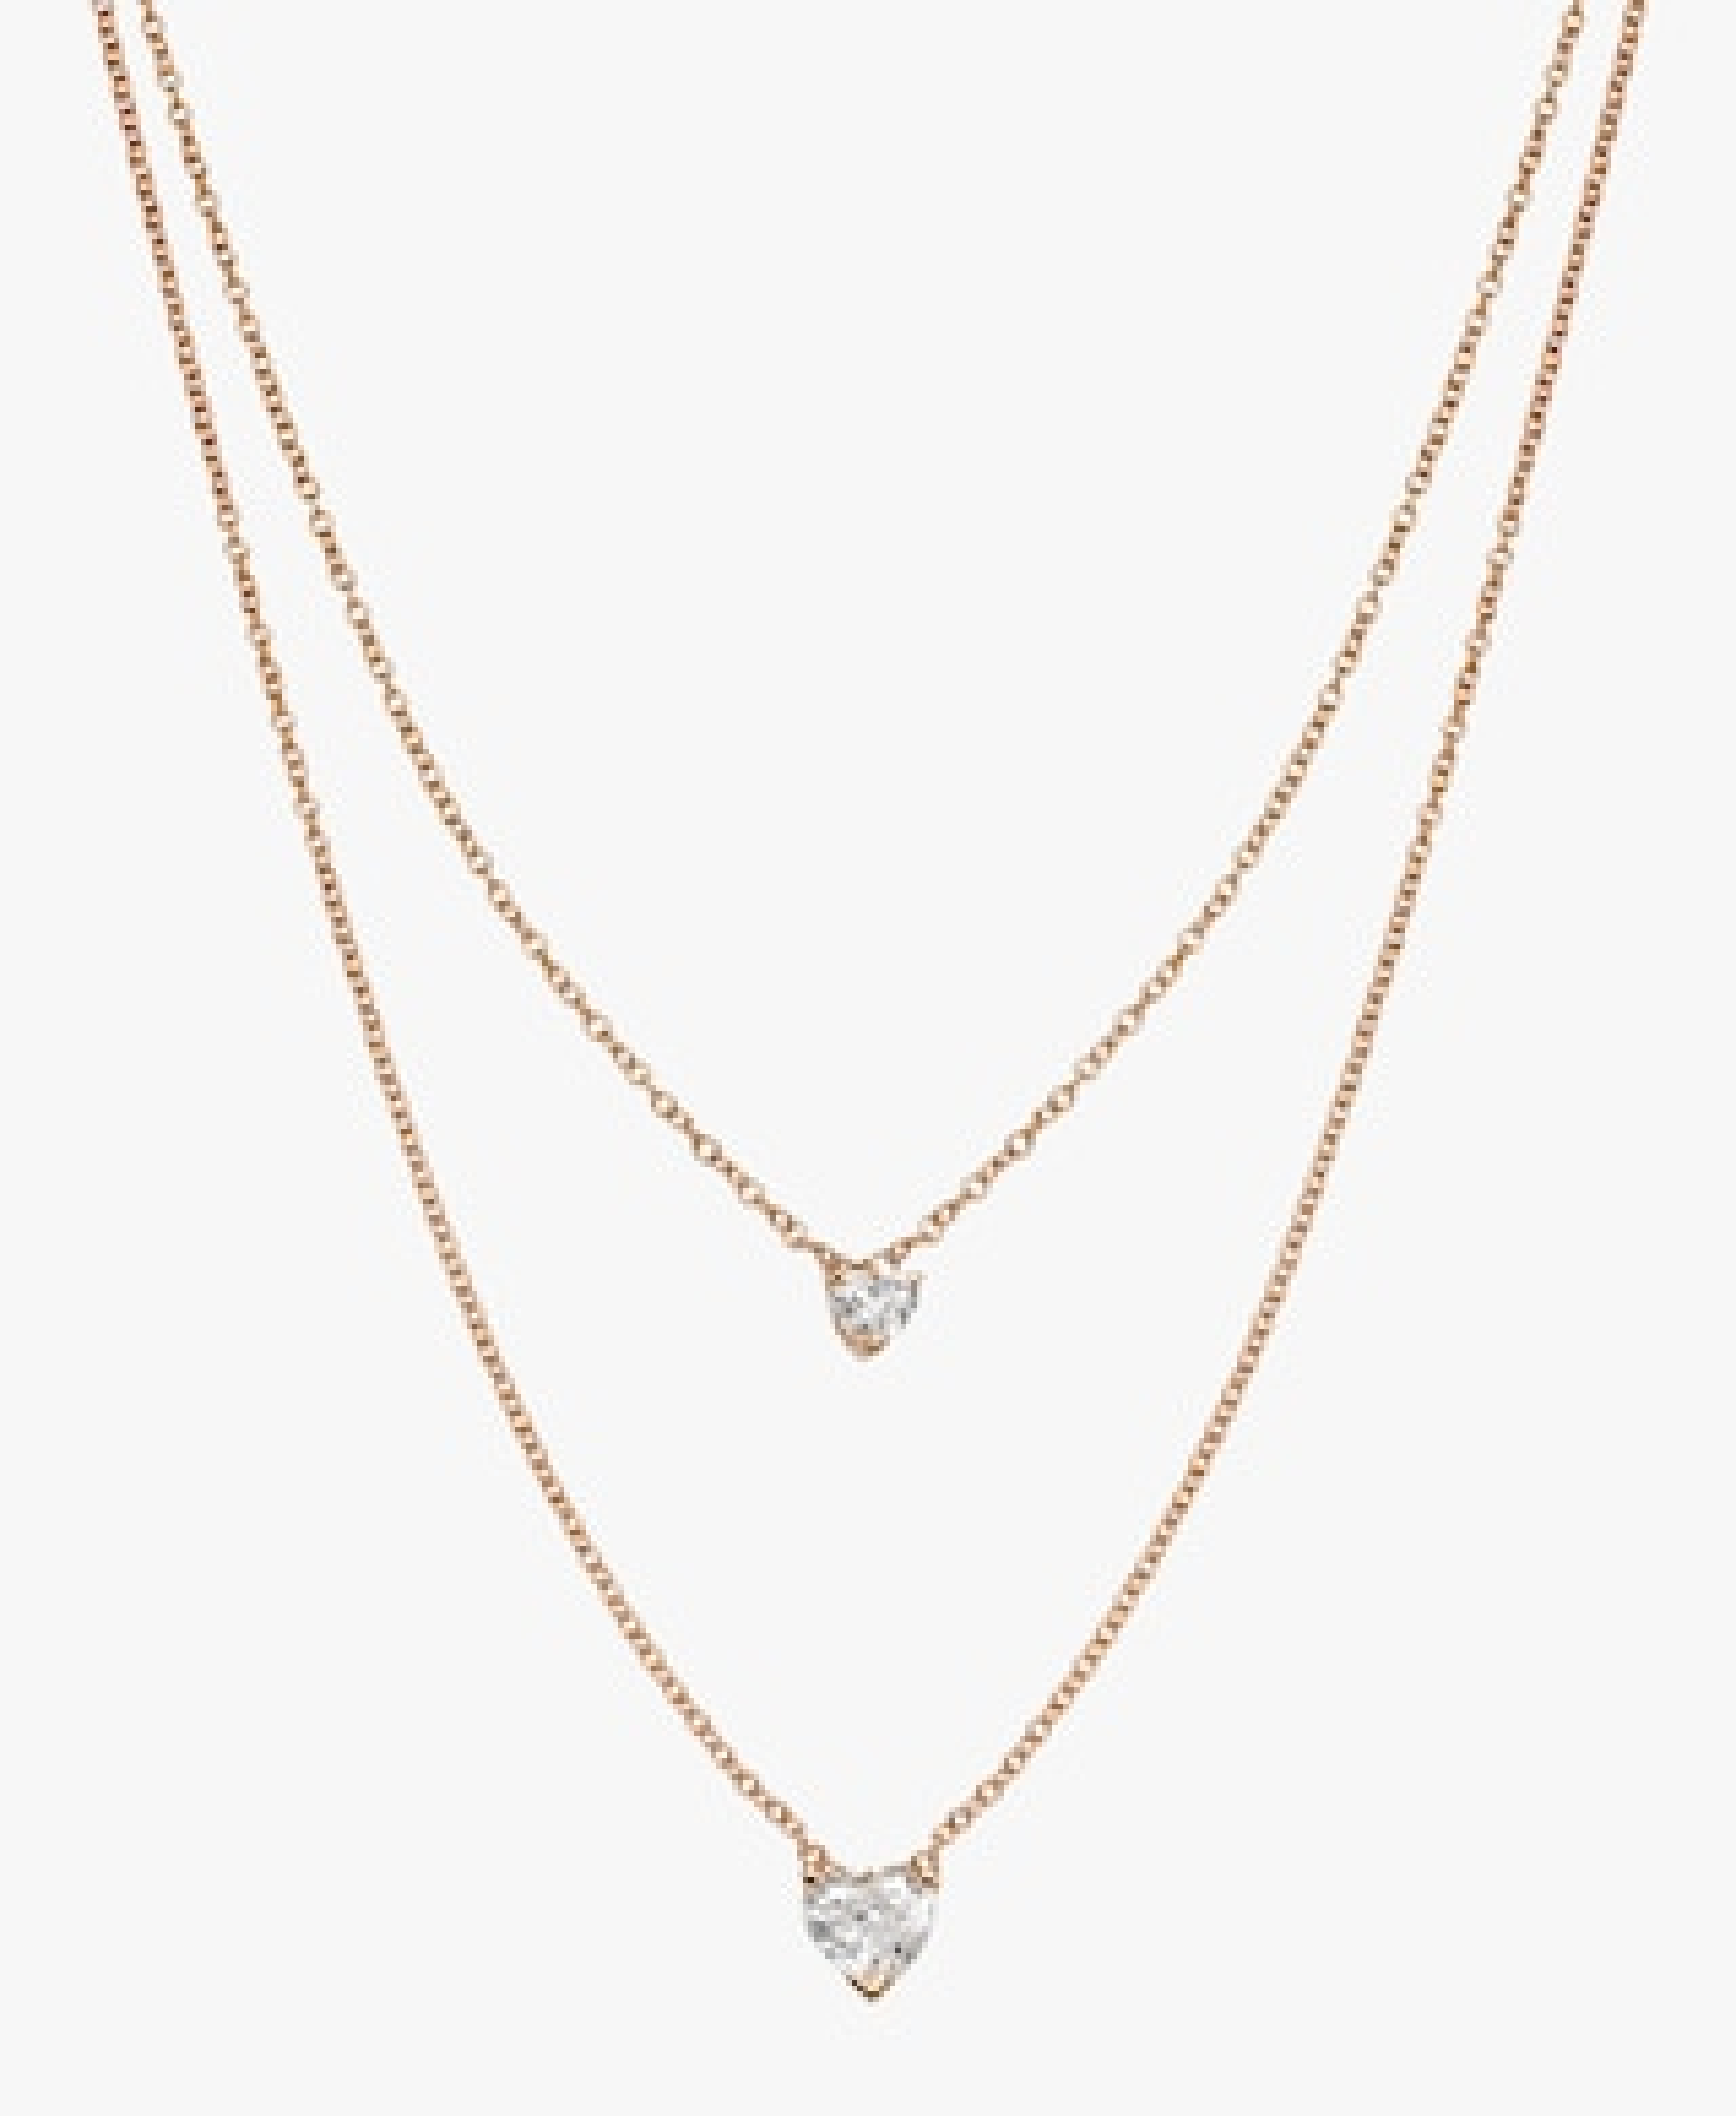 Chérut Two Hearts Necklace 1